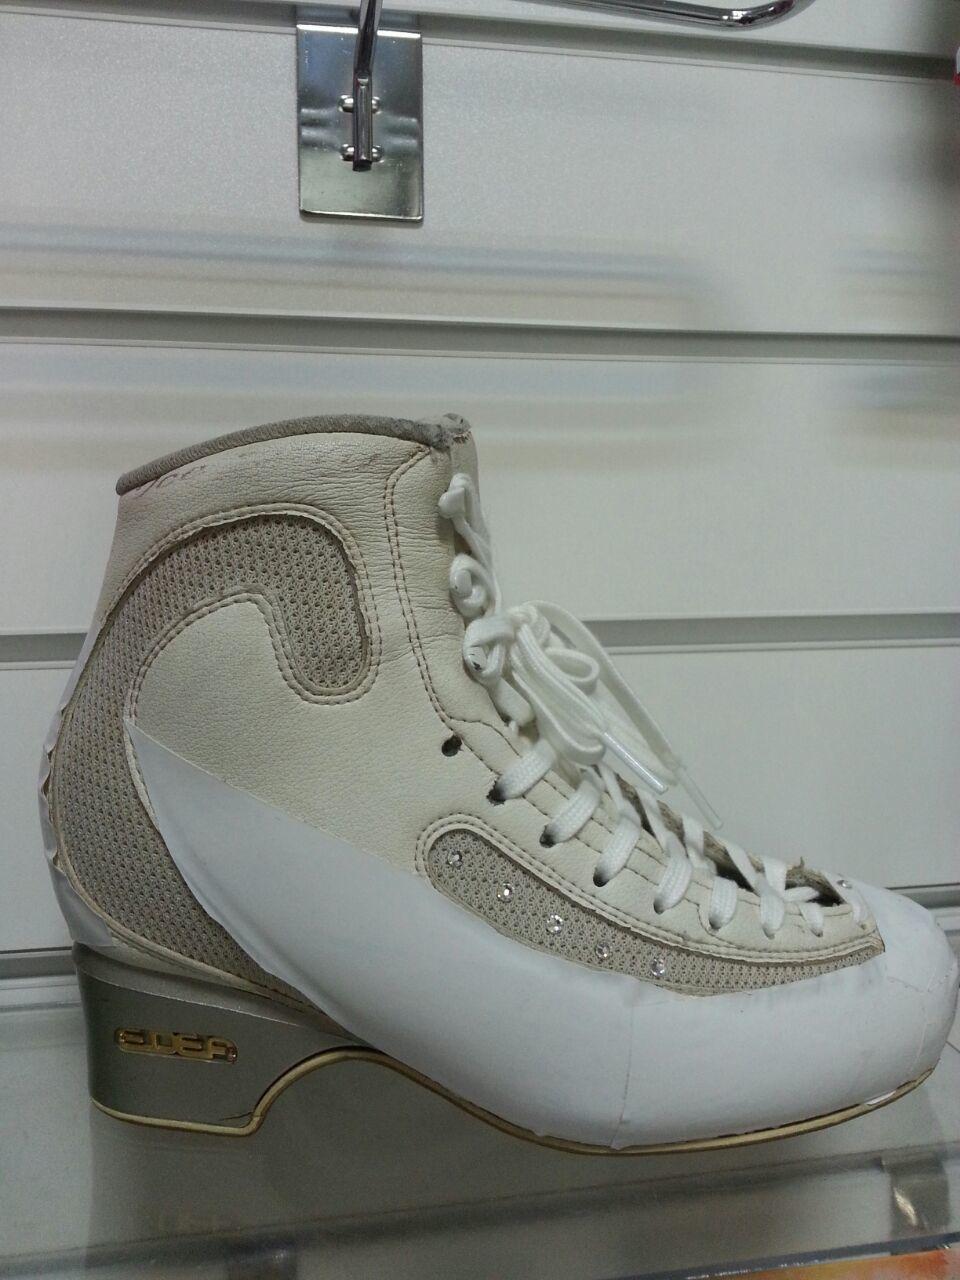 ca793f59 Ботинки б/у Edea ICE FLY, размер 240